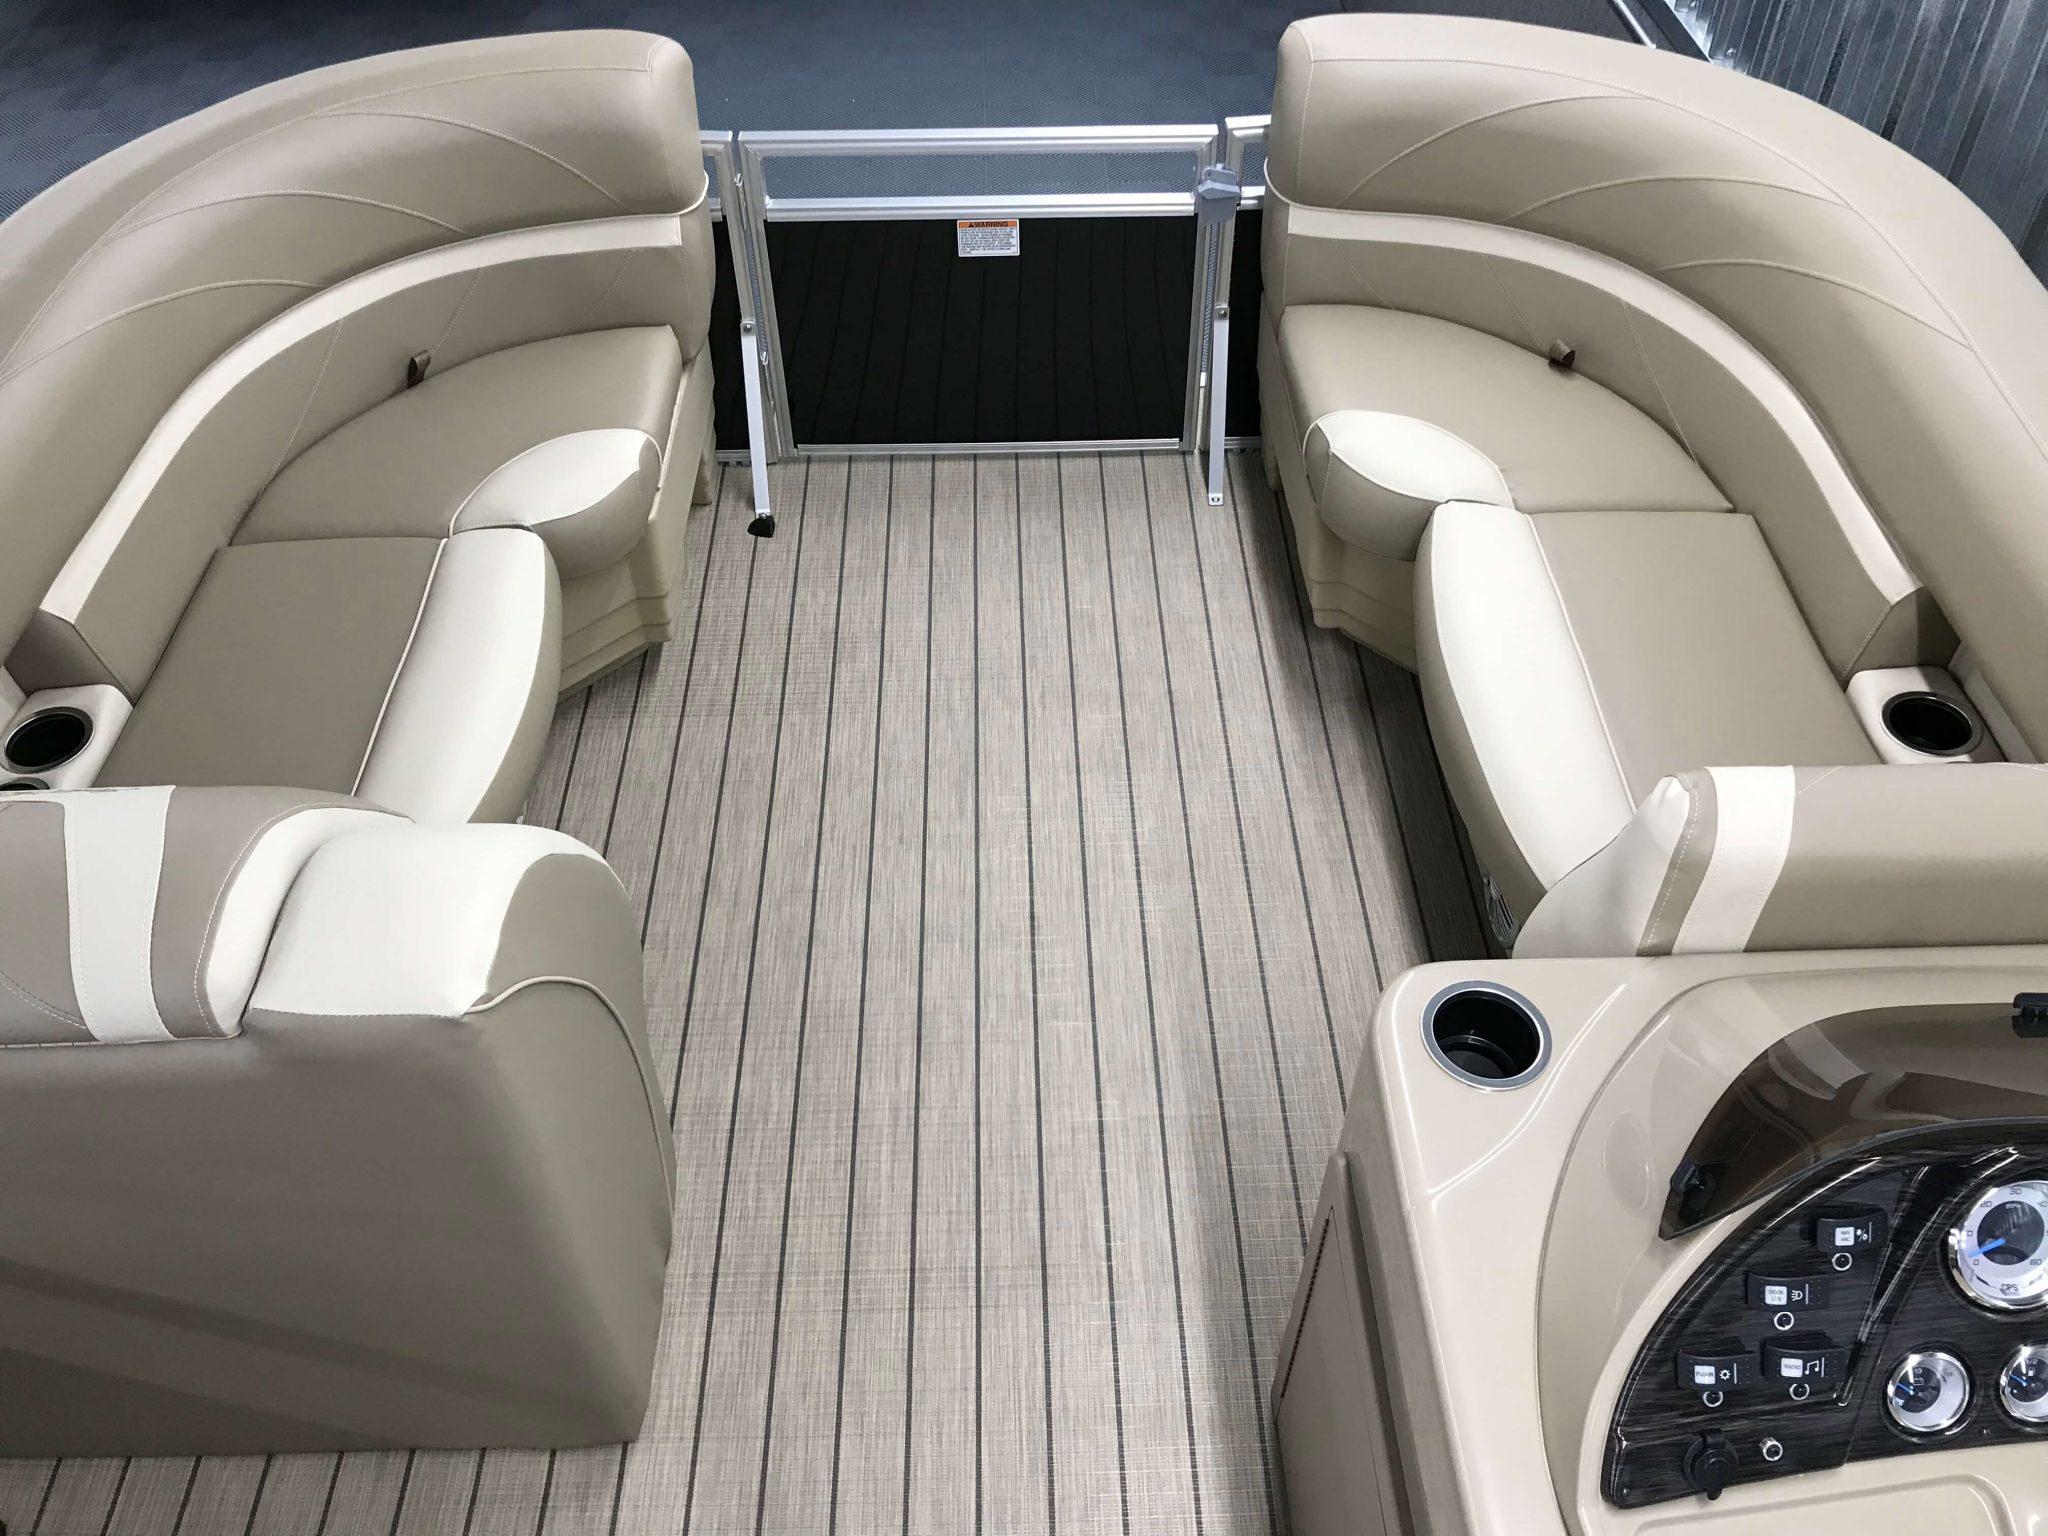 2019 SunChaser Geneva 22 LR Layout 2